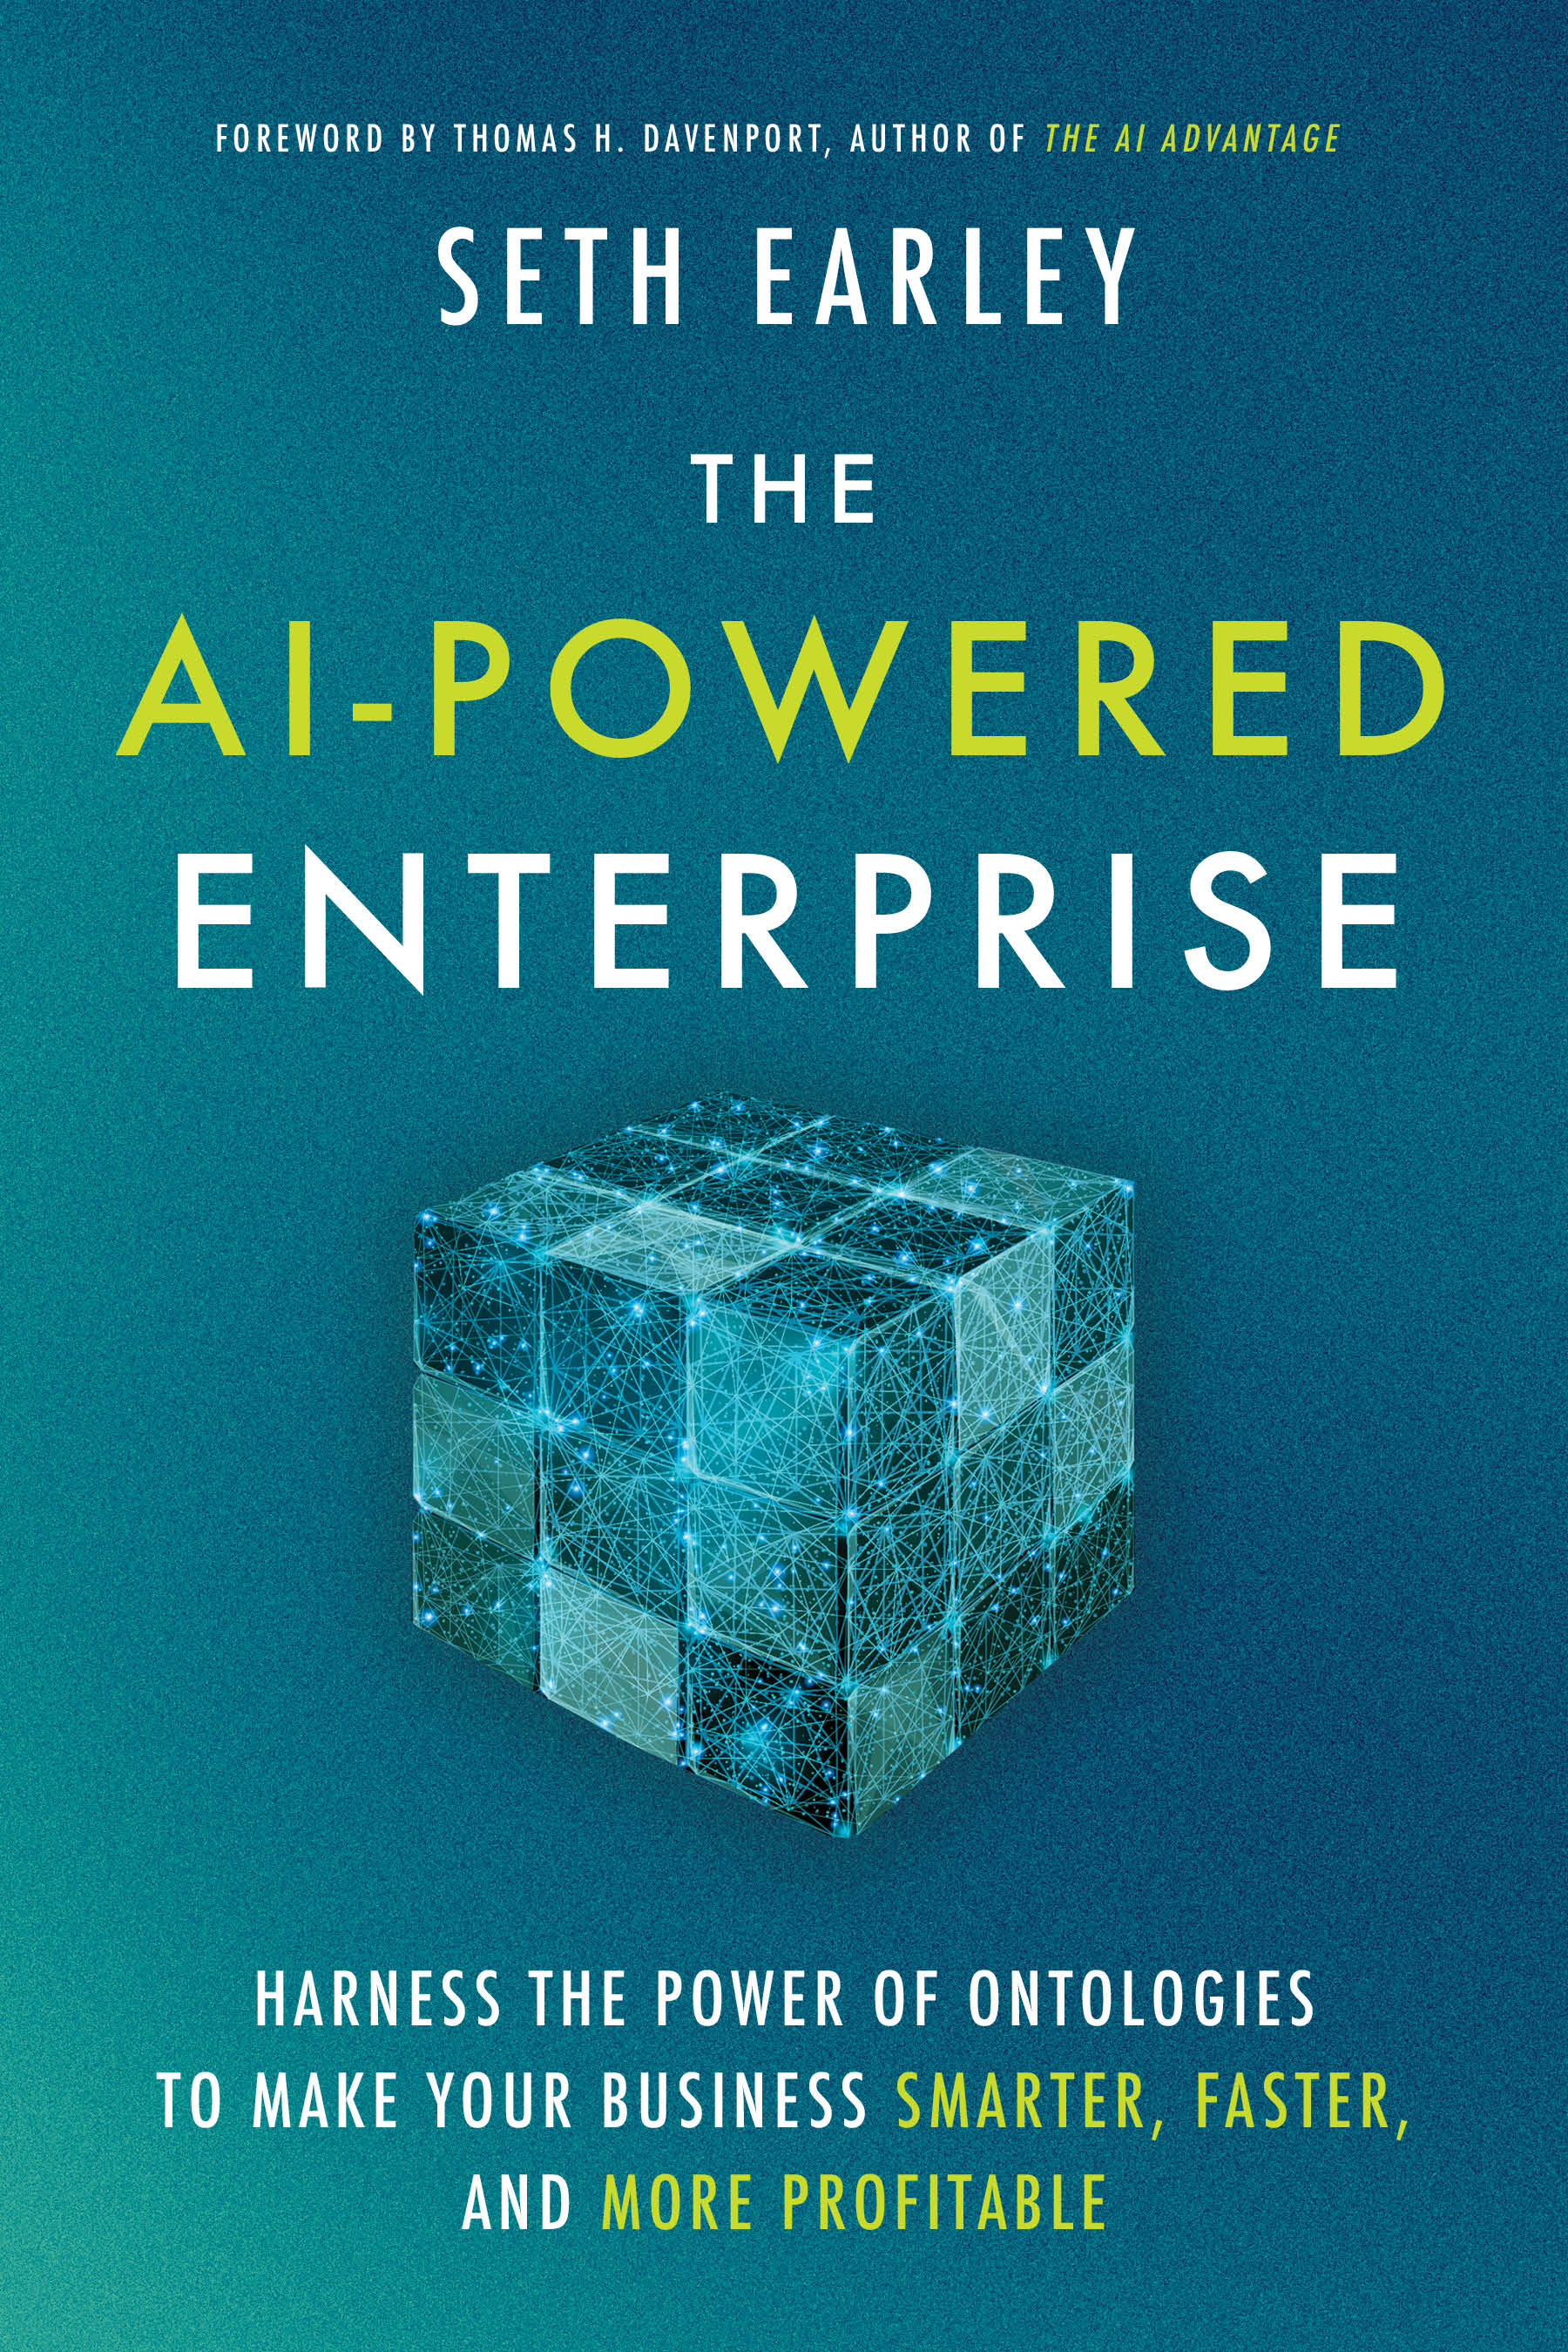 The AI-Powered Enterprise